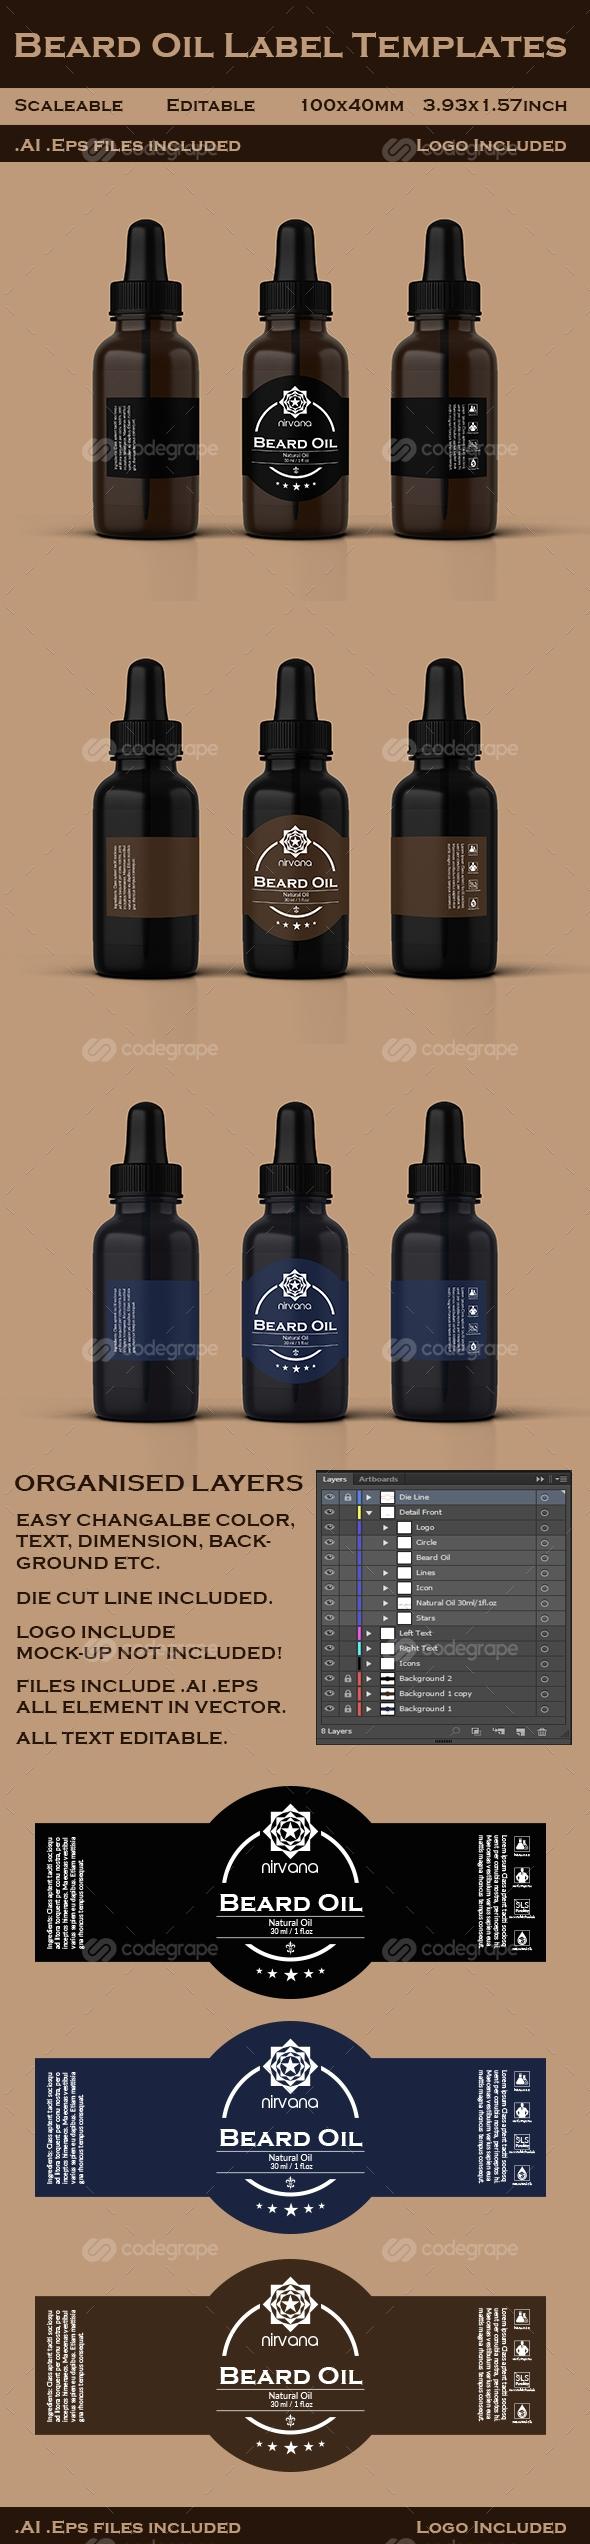 Beard Oil Label Templates Print | CodeGrape